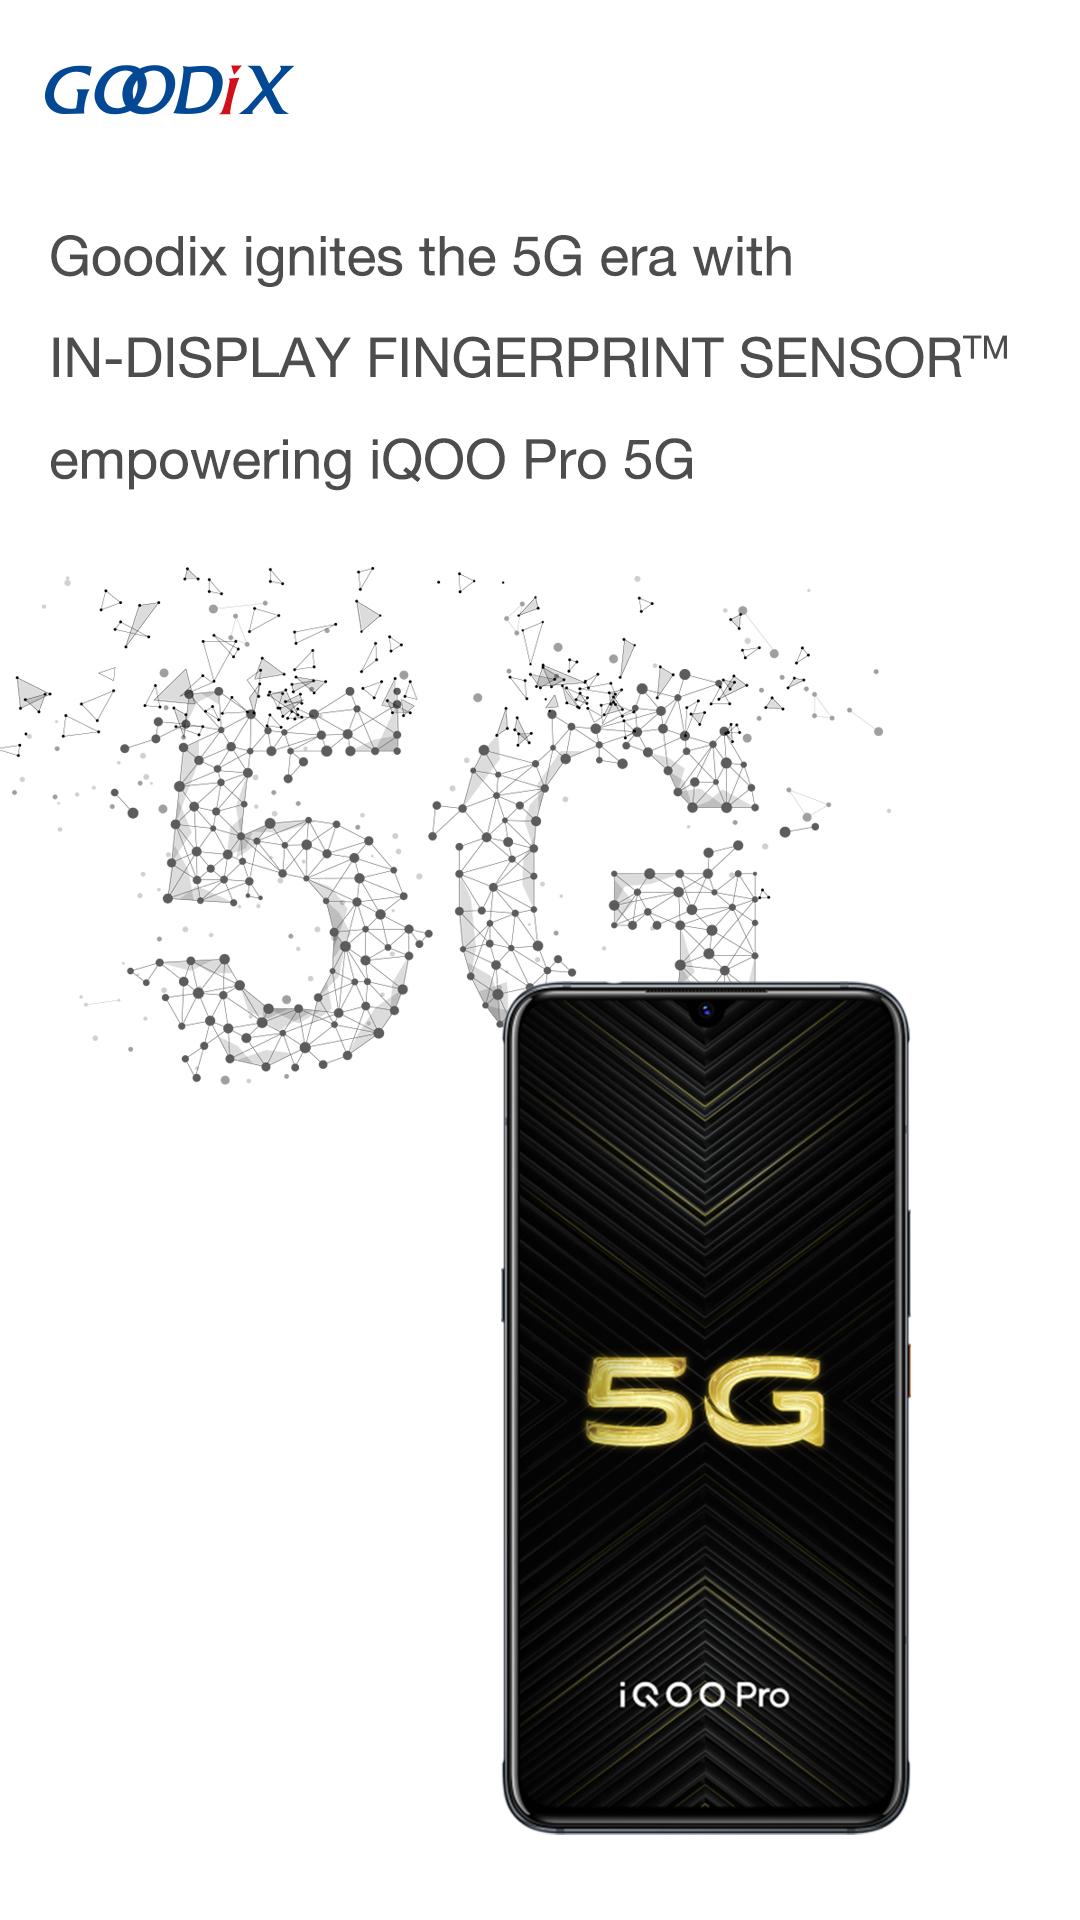 Goodix Ignites the 5G Era with IN-DISPLAY FINGERPRINT SENSOR